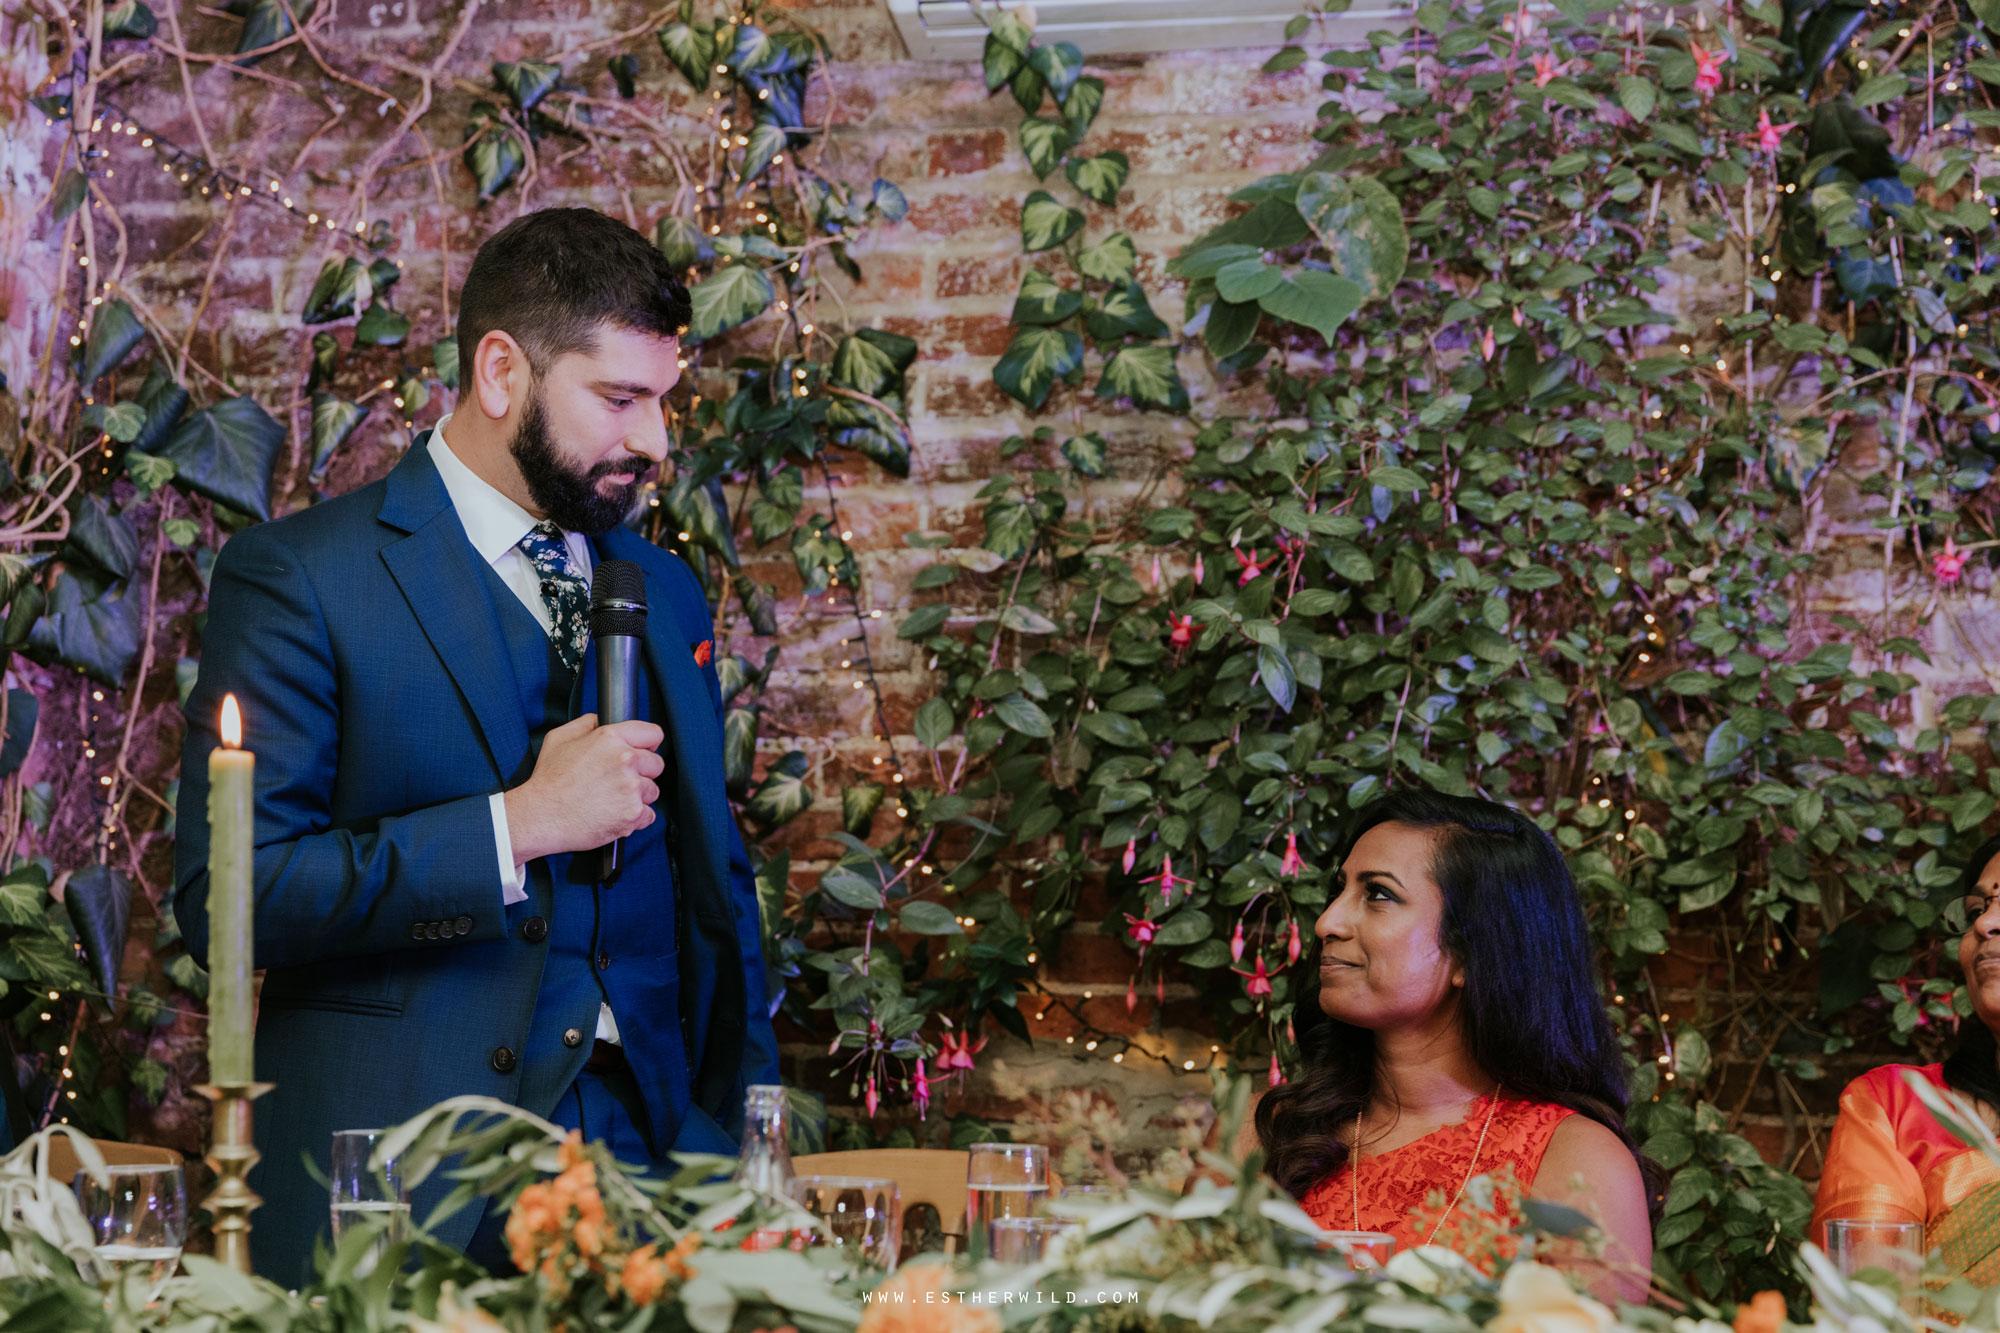 Northbrook_Park_Farnham_Surrey_London_Wedding_Hindu_Fusion_Esther_Wild_Photographer_IMG_6563.jpg